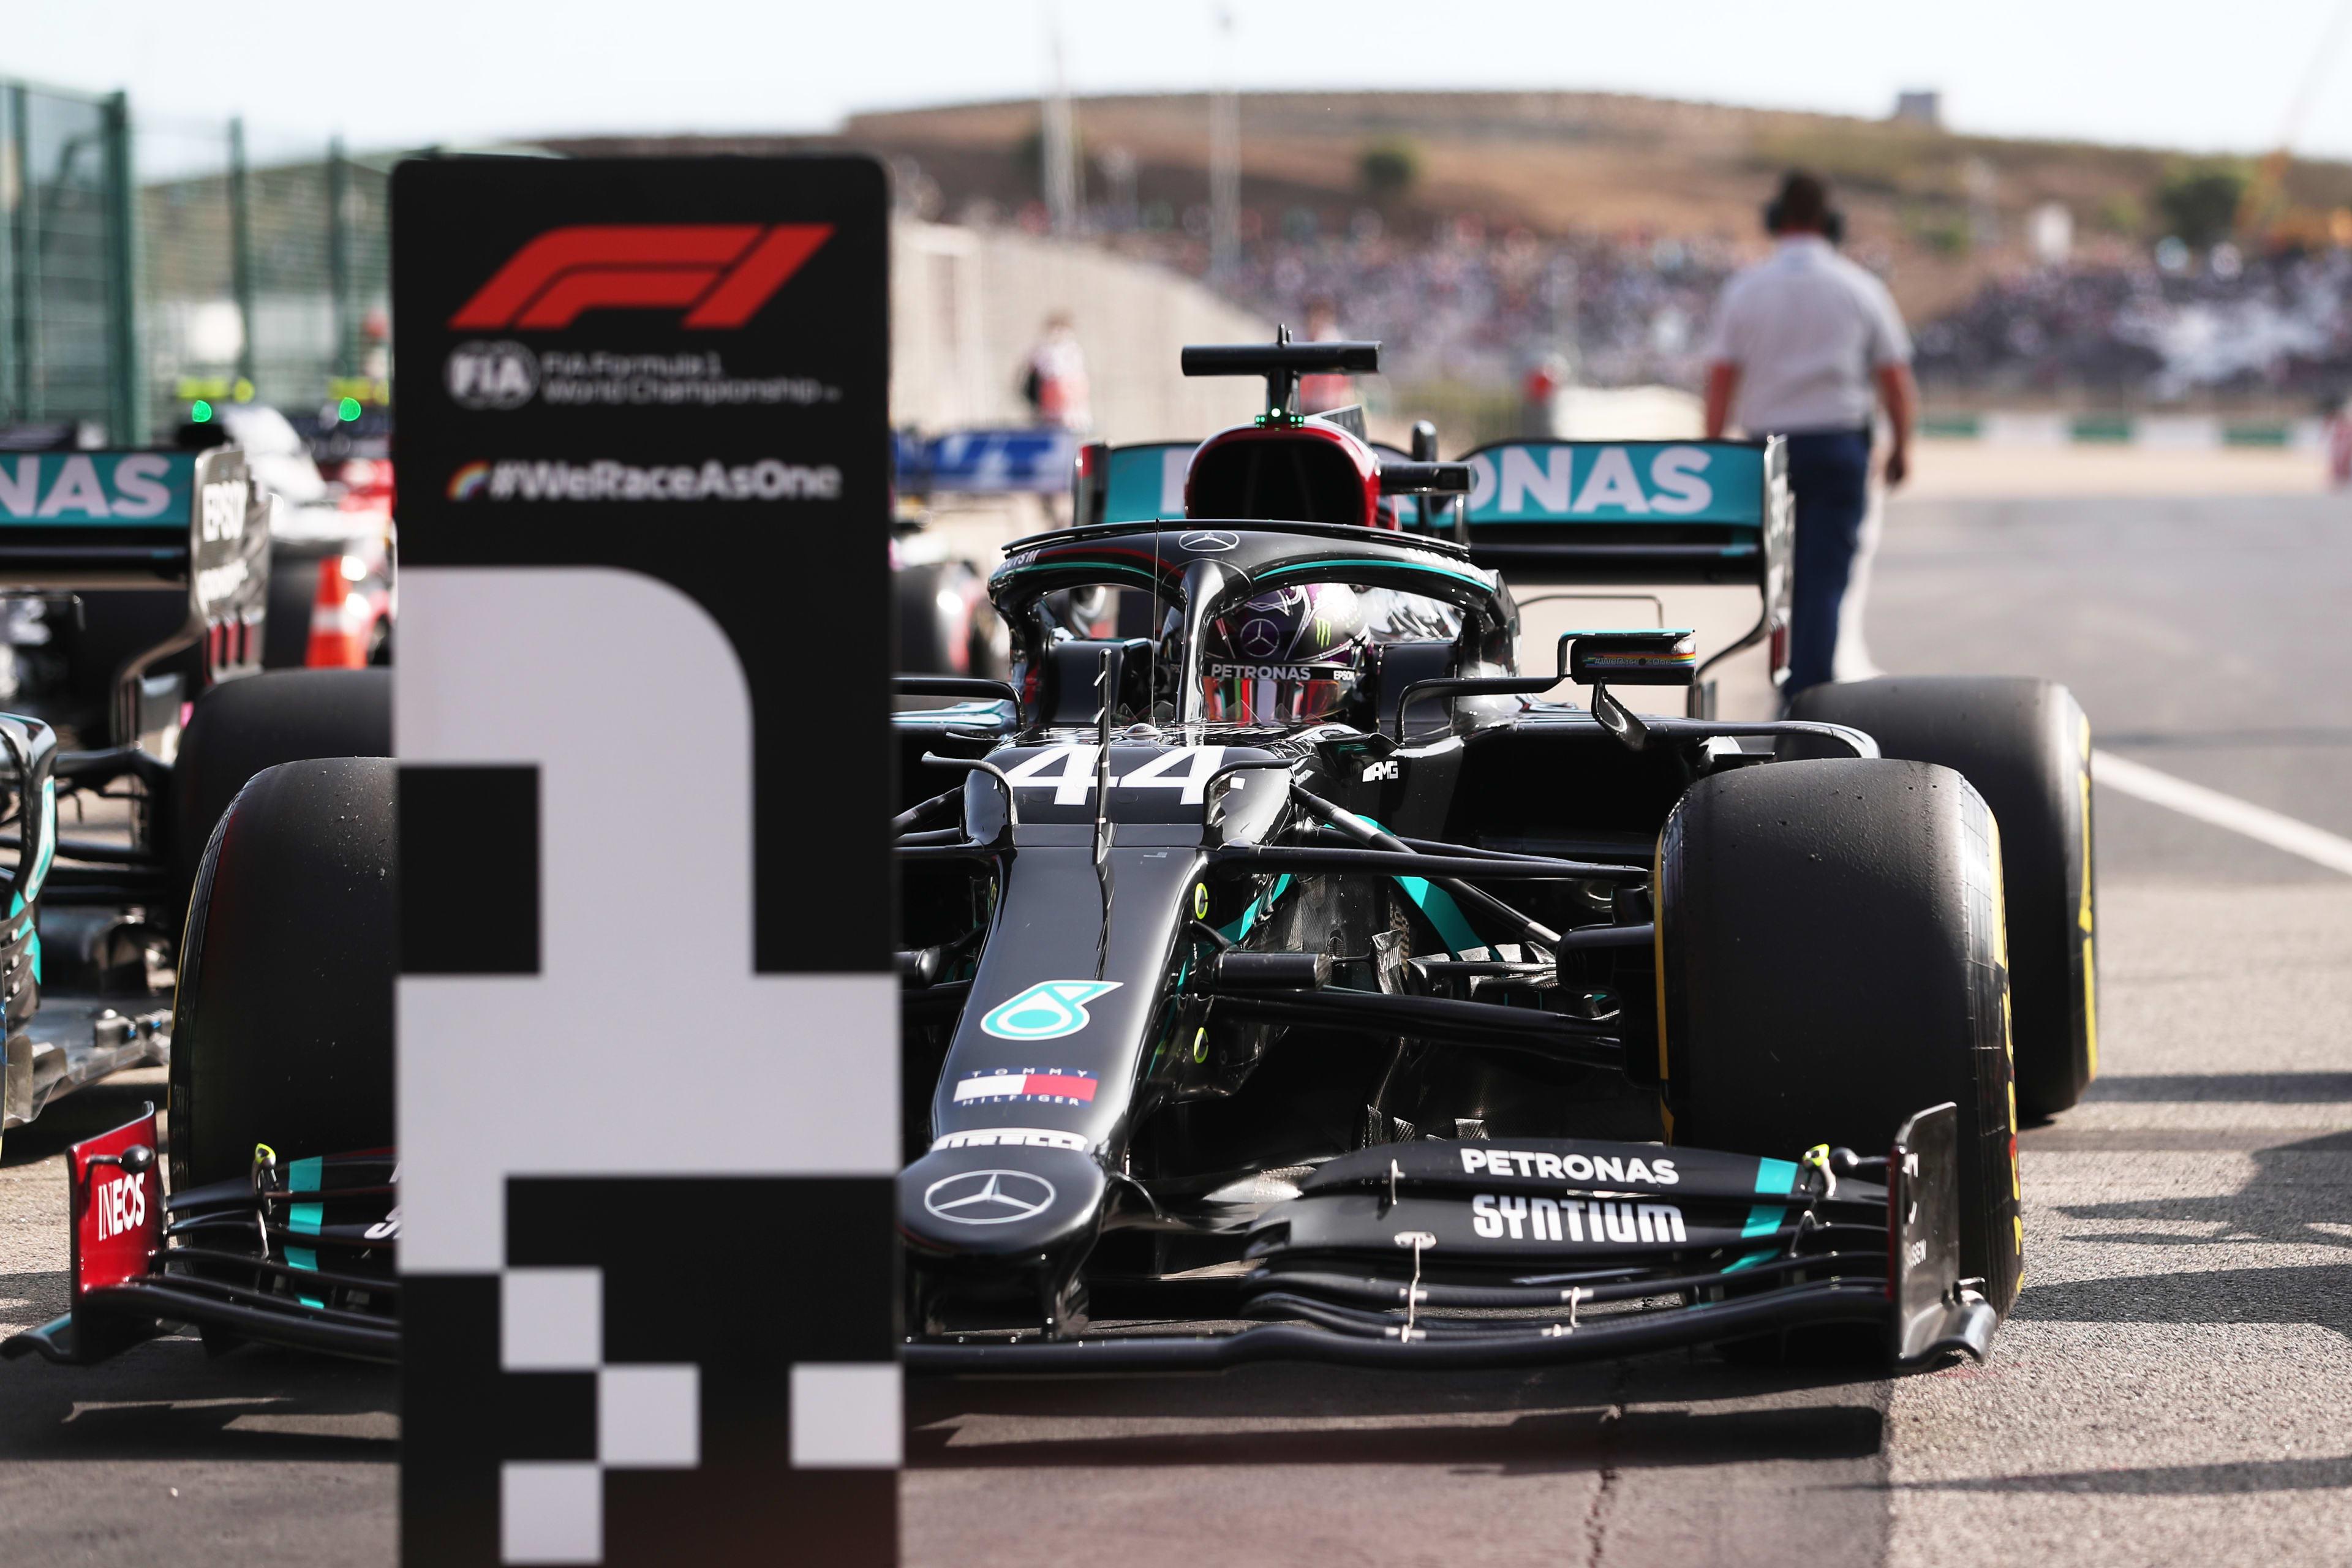 2020 Portuguese Grand Prix qualifying report: Hamilton beats Bottas to Portuguese GP pole with final charging run at Portimao | Formula 1®